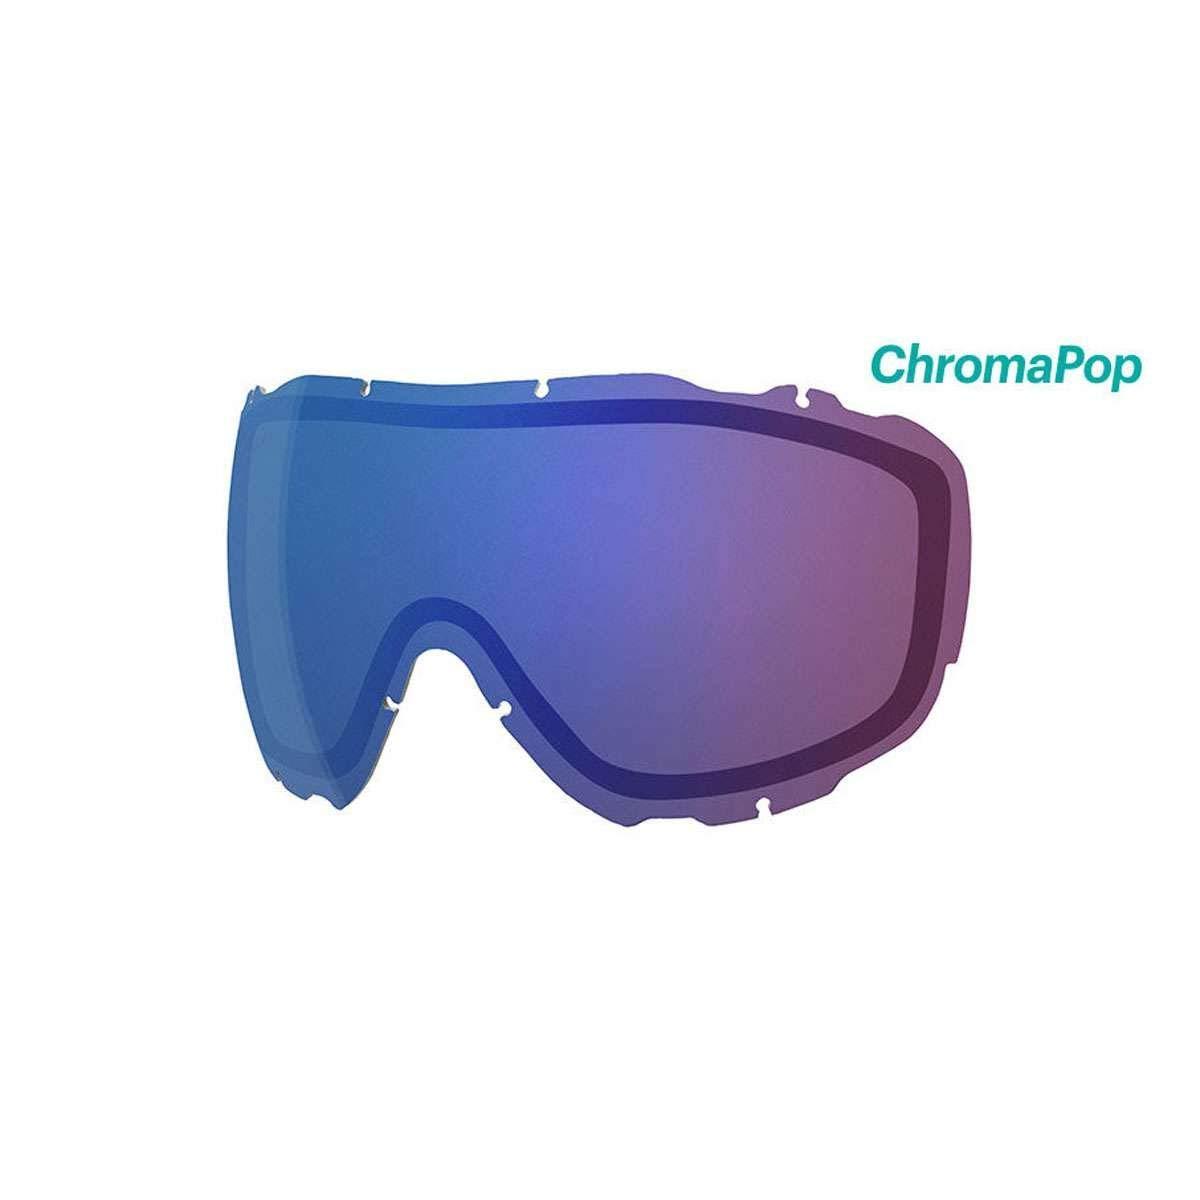 c3cbe4c7d19 Smith Optics Prophecy Turbo Adult Replacement Lense Snow Goggles  Accessories - Chromapop Photochromic Rose Flash